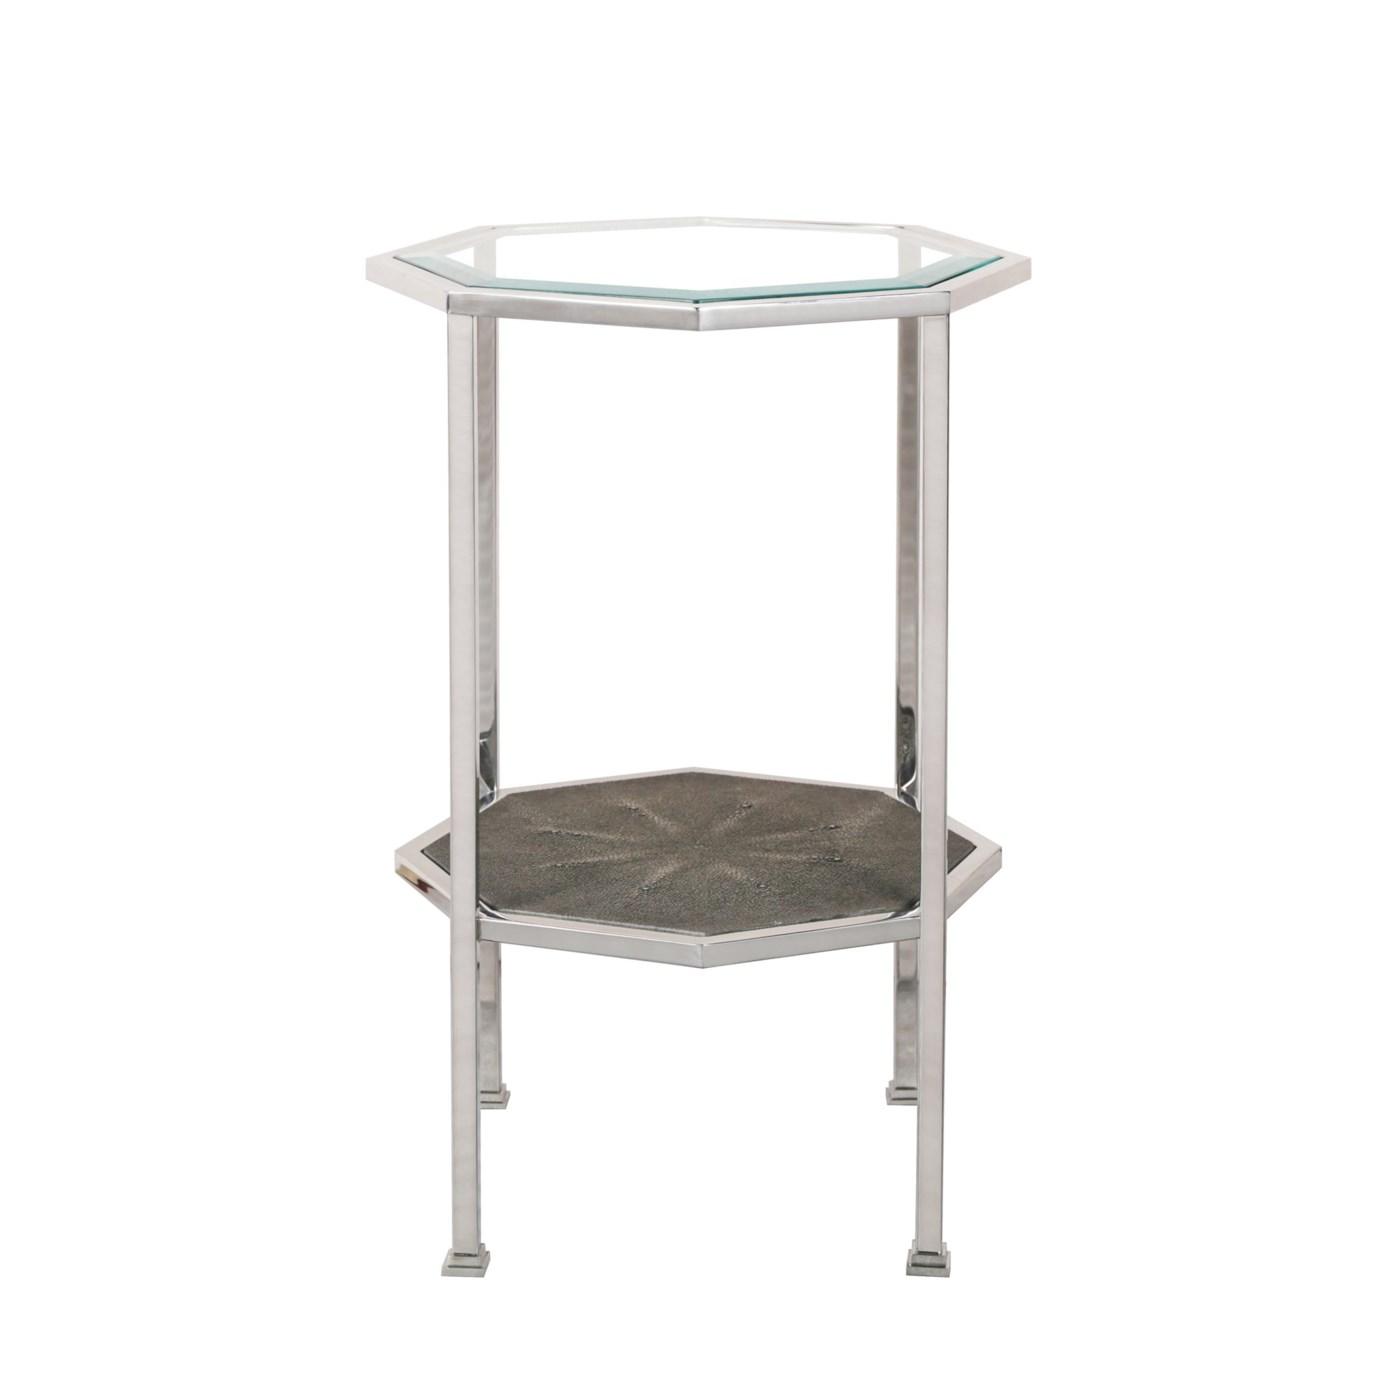 Hexagonal Accent Table